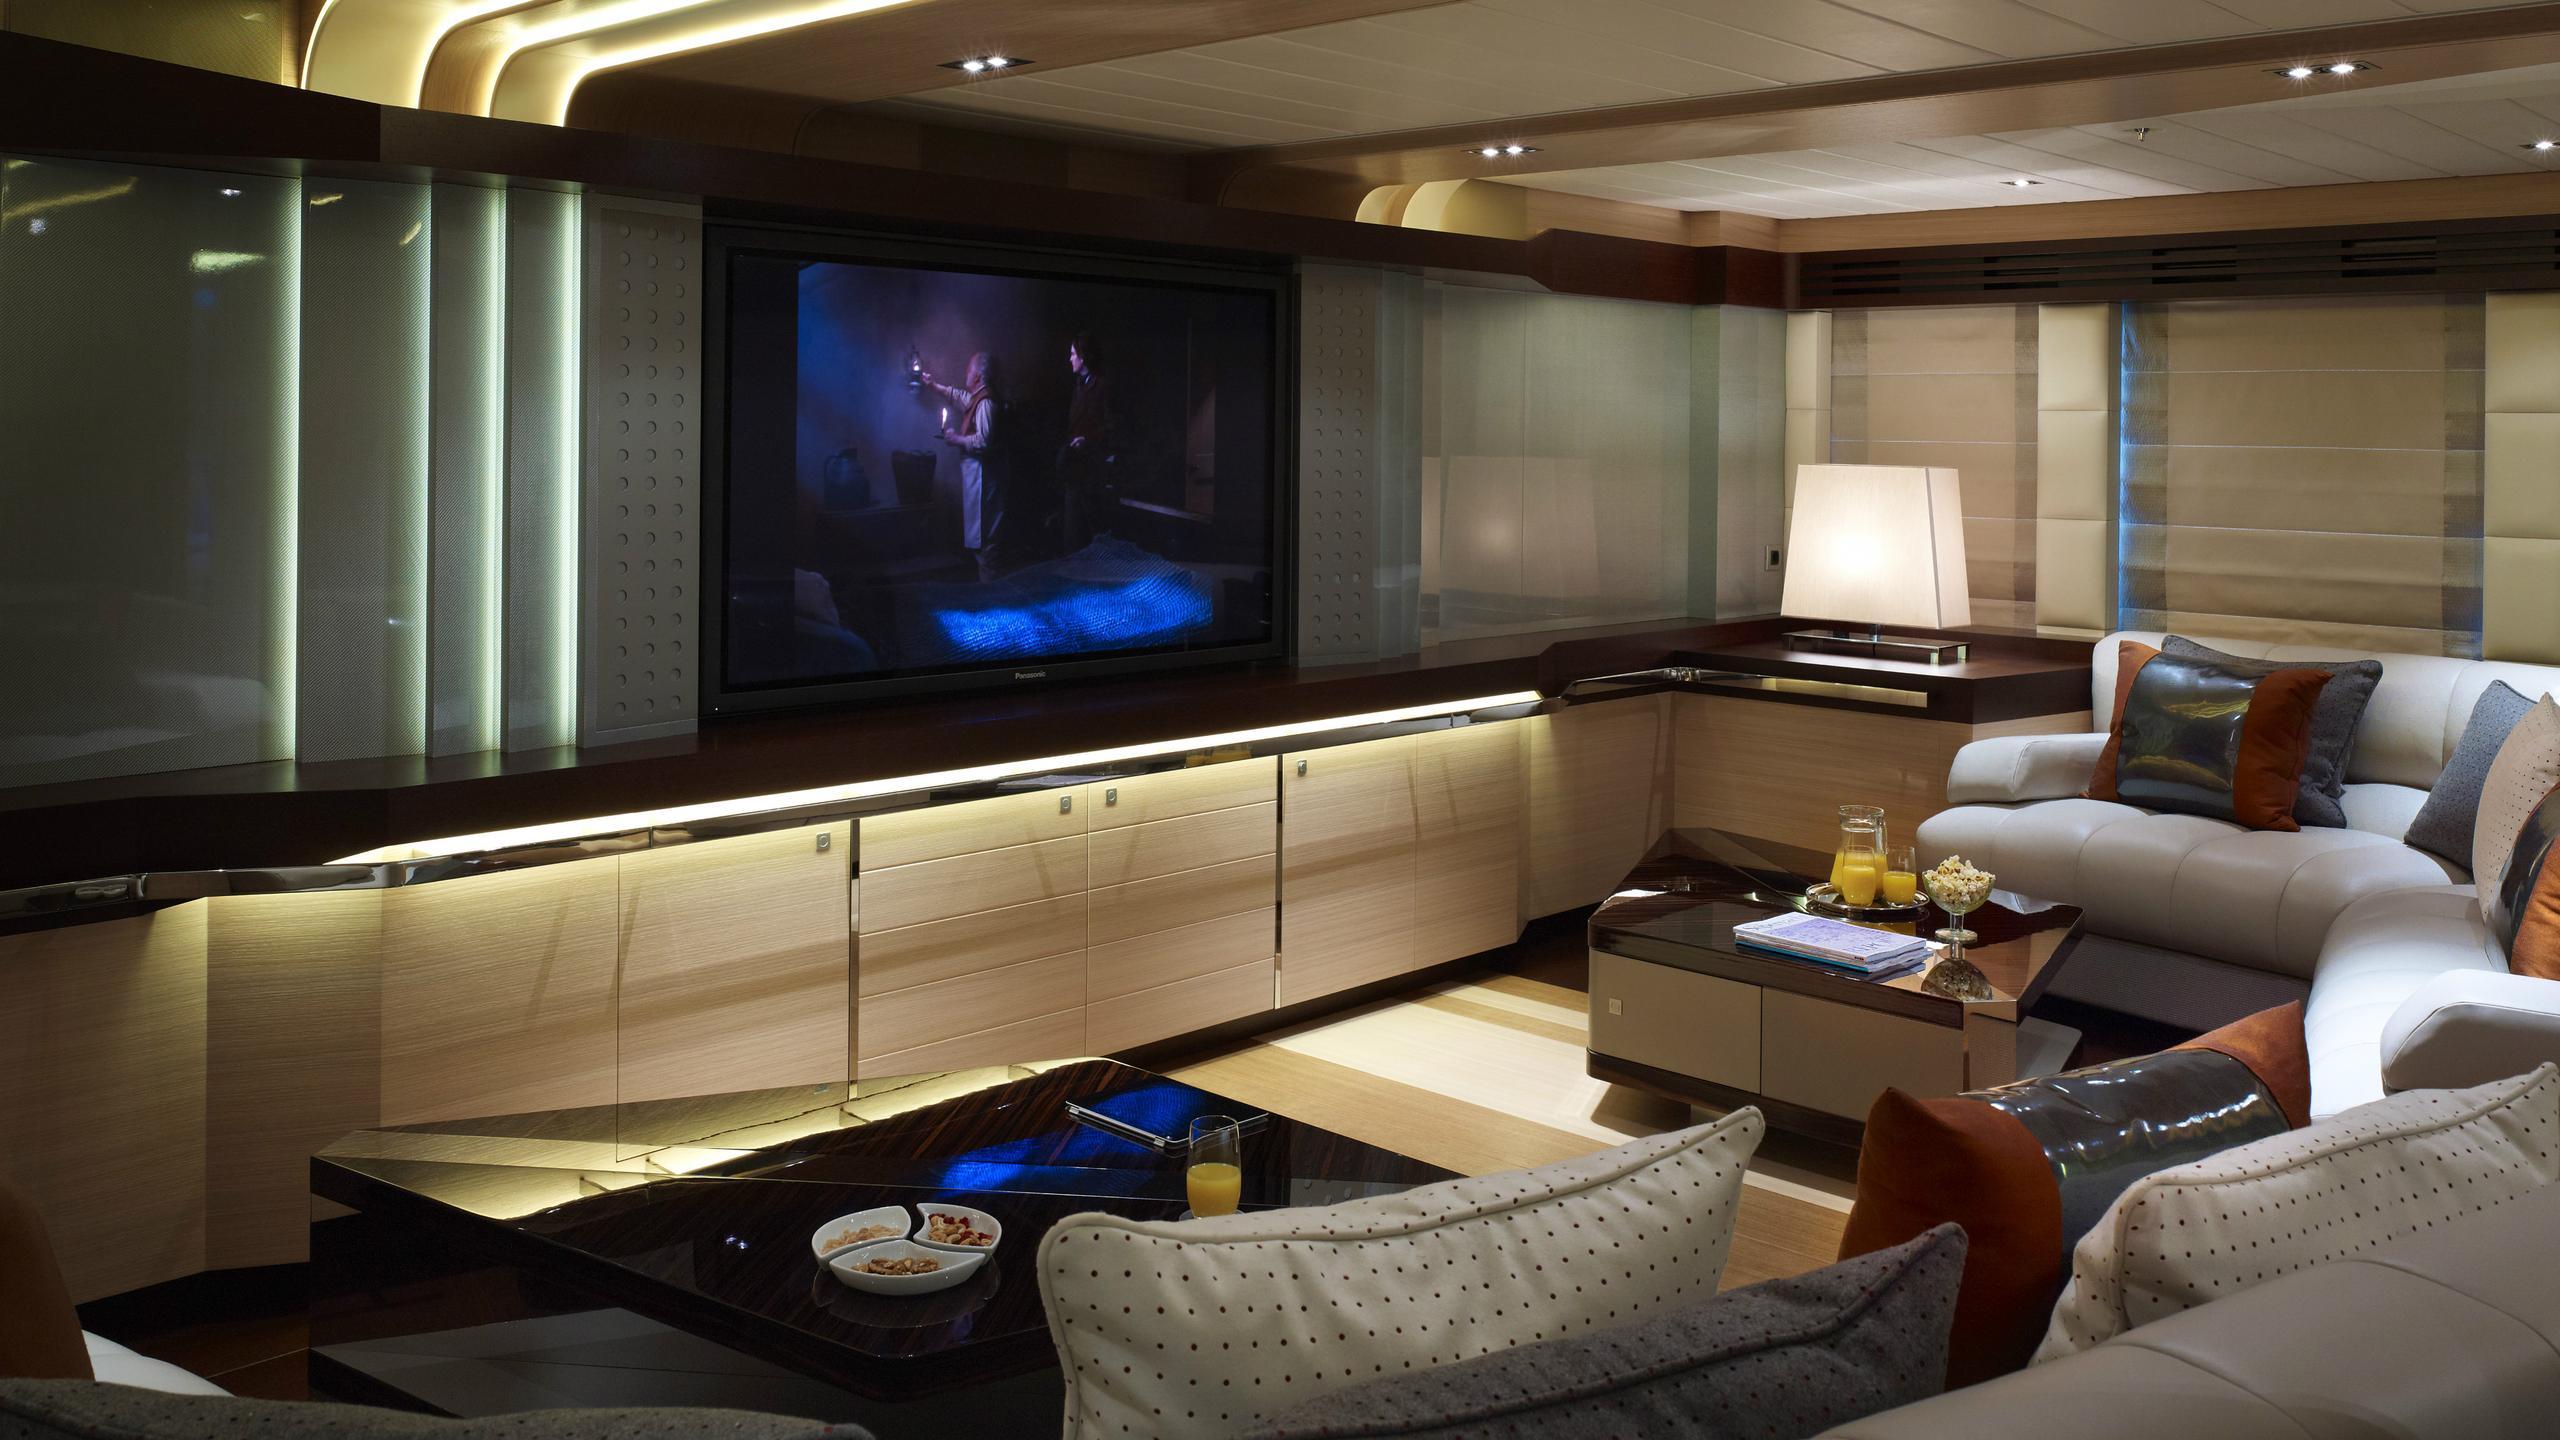 odyssea-como-lady-petra-motor-yacht-heesen-2012-47m-cinema